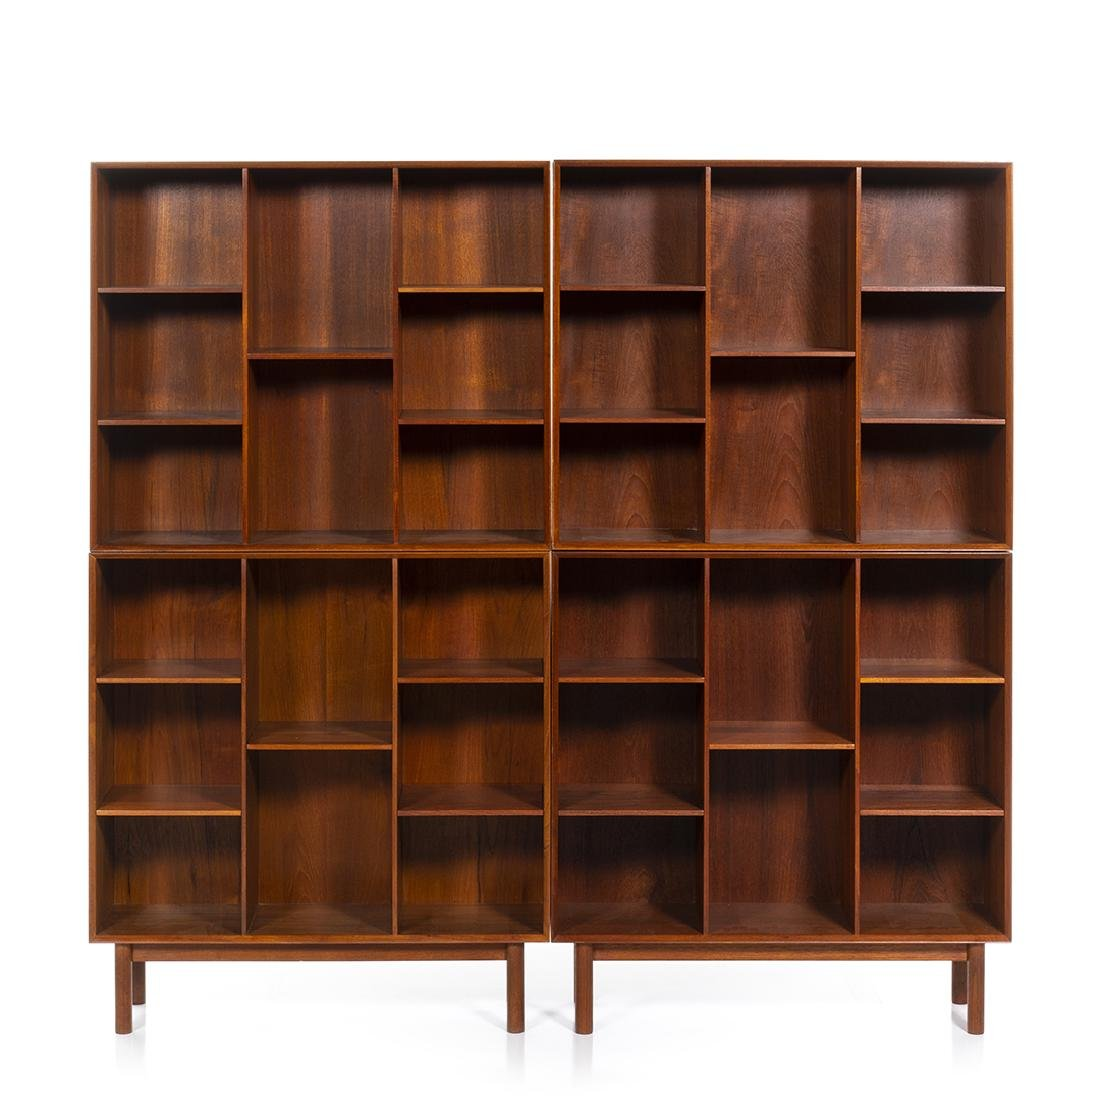 Peter Hvidt Bookcases (4)